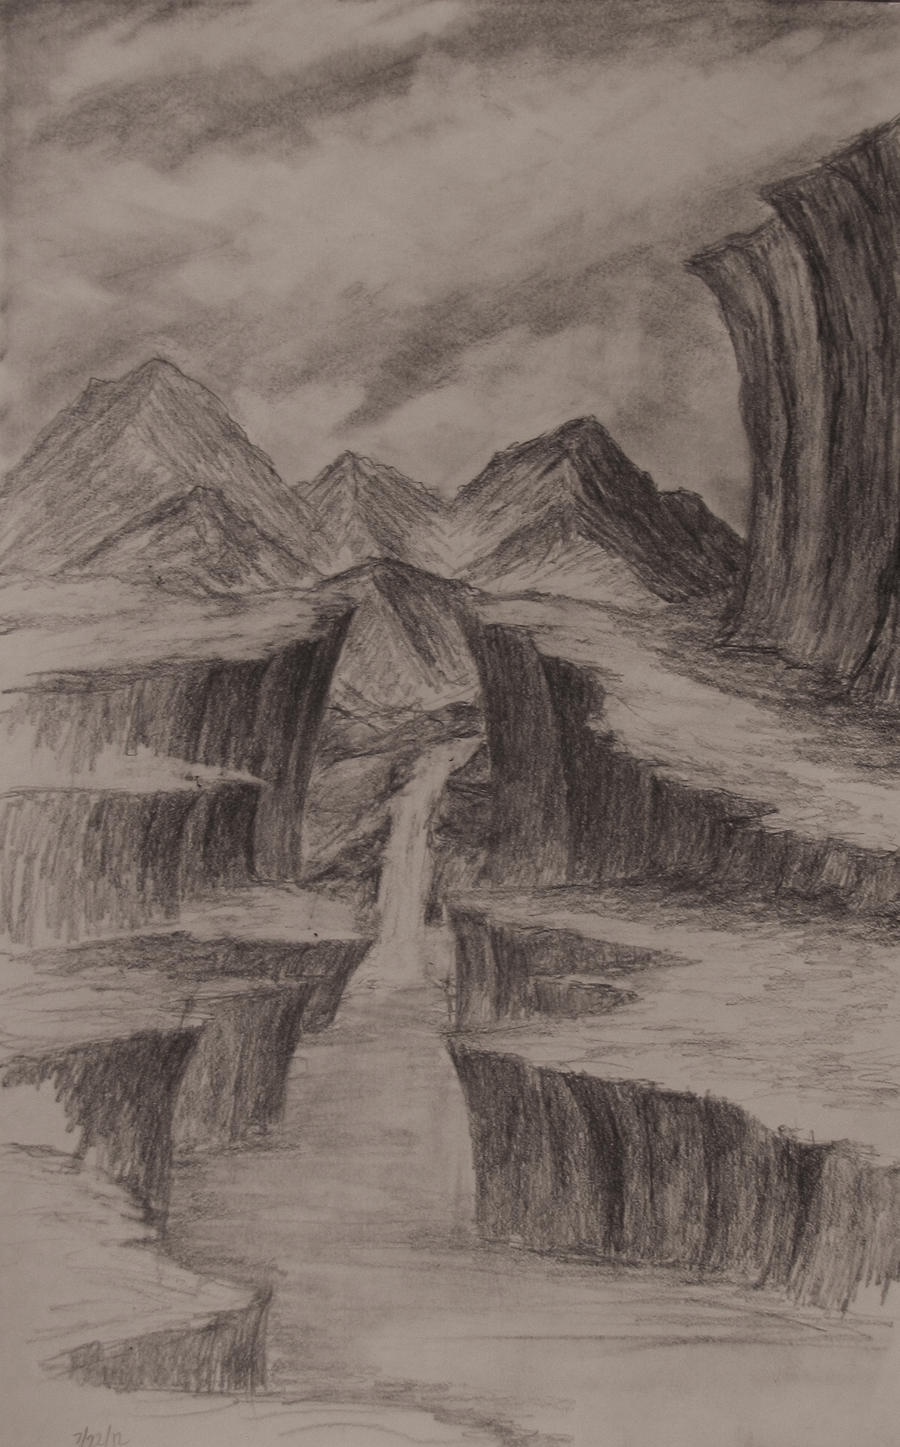 Sketch: The Big Cliffs